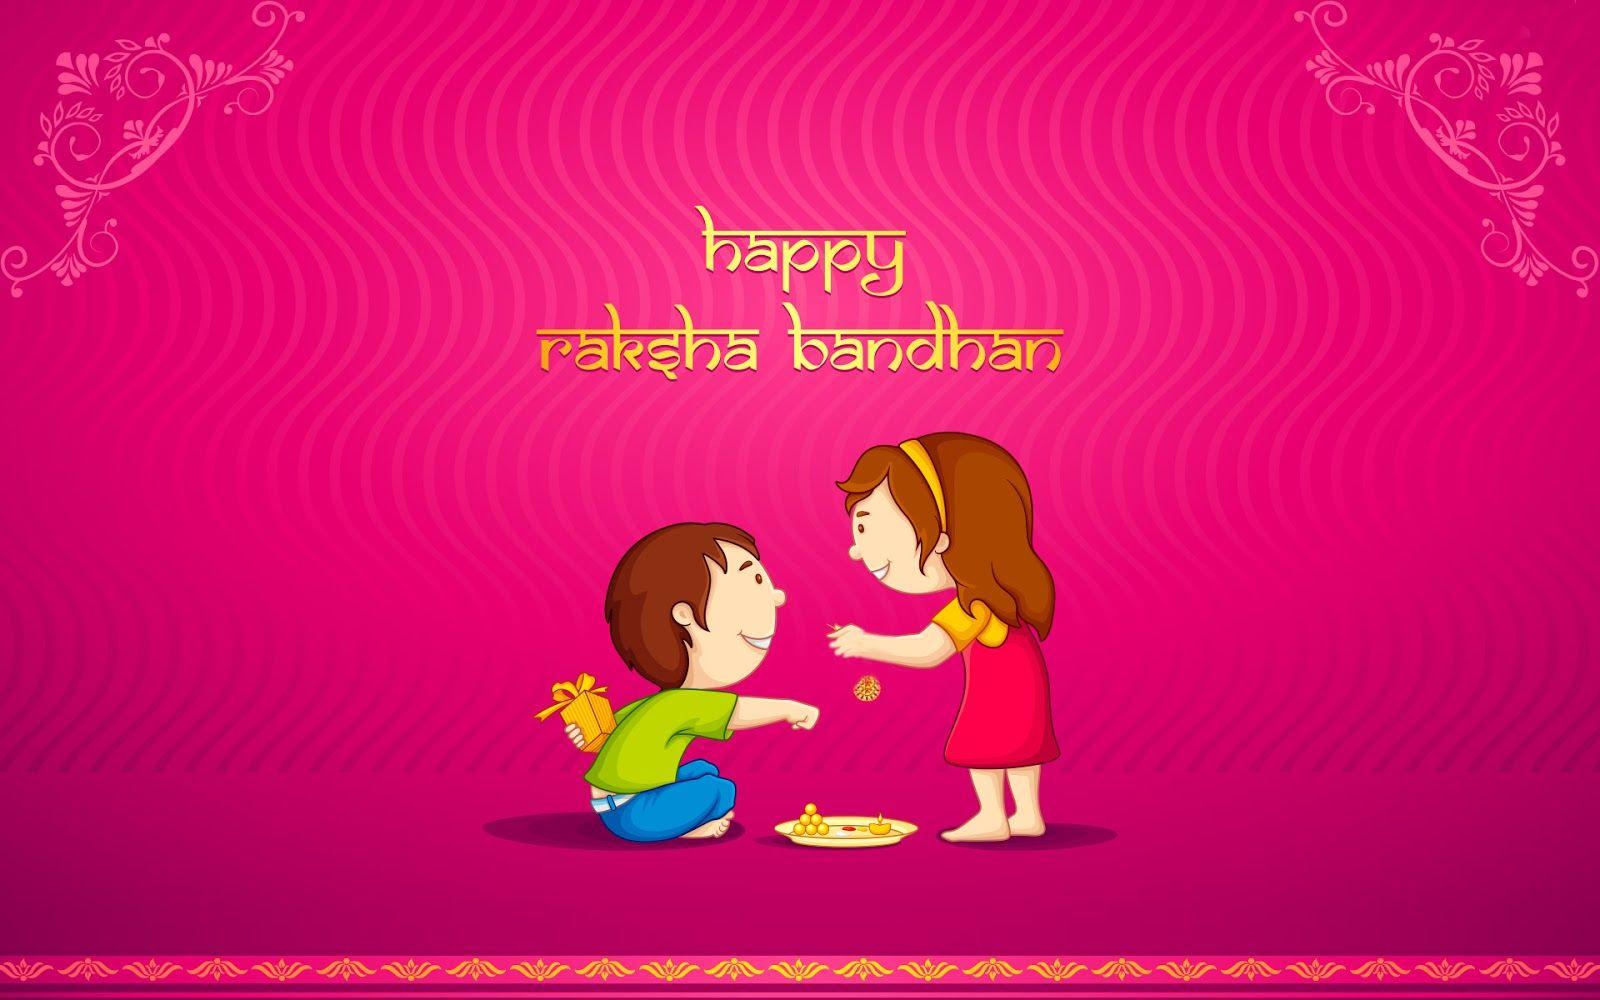 Download Latest Happy Raksha Bandhan Ultra Hd 4k Wallpaper Images Pictures Desktop Happy Raksha Bandhan Images Raksha Bandhan Wishes Raksha Bandhan Images